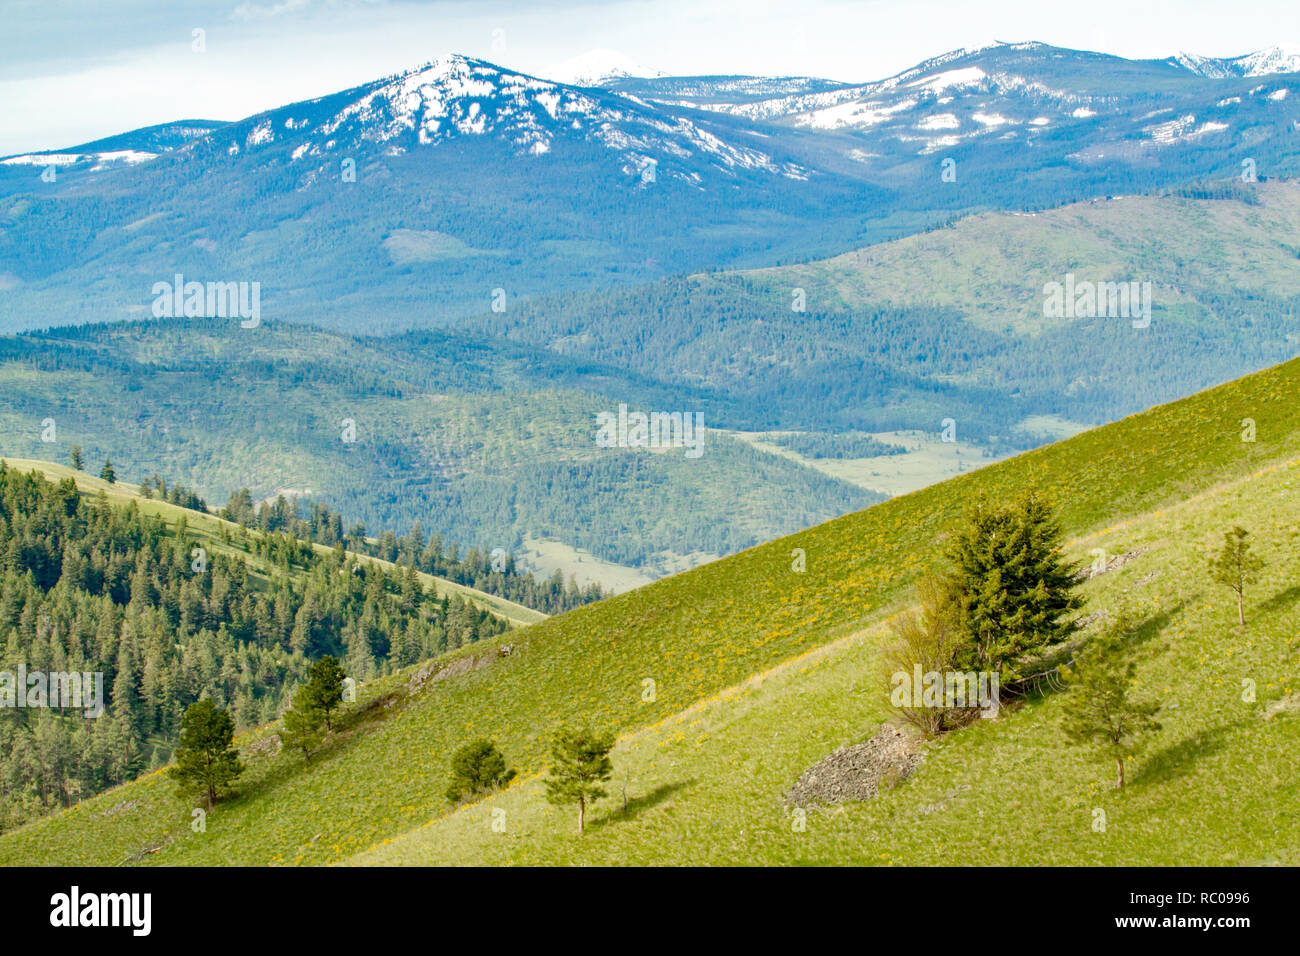 Palouse Prairie grasslands on steep hills in National Bison Range, Montana Stock Photo